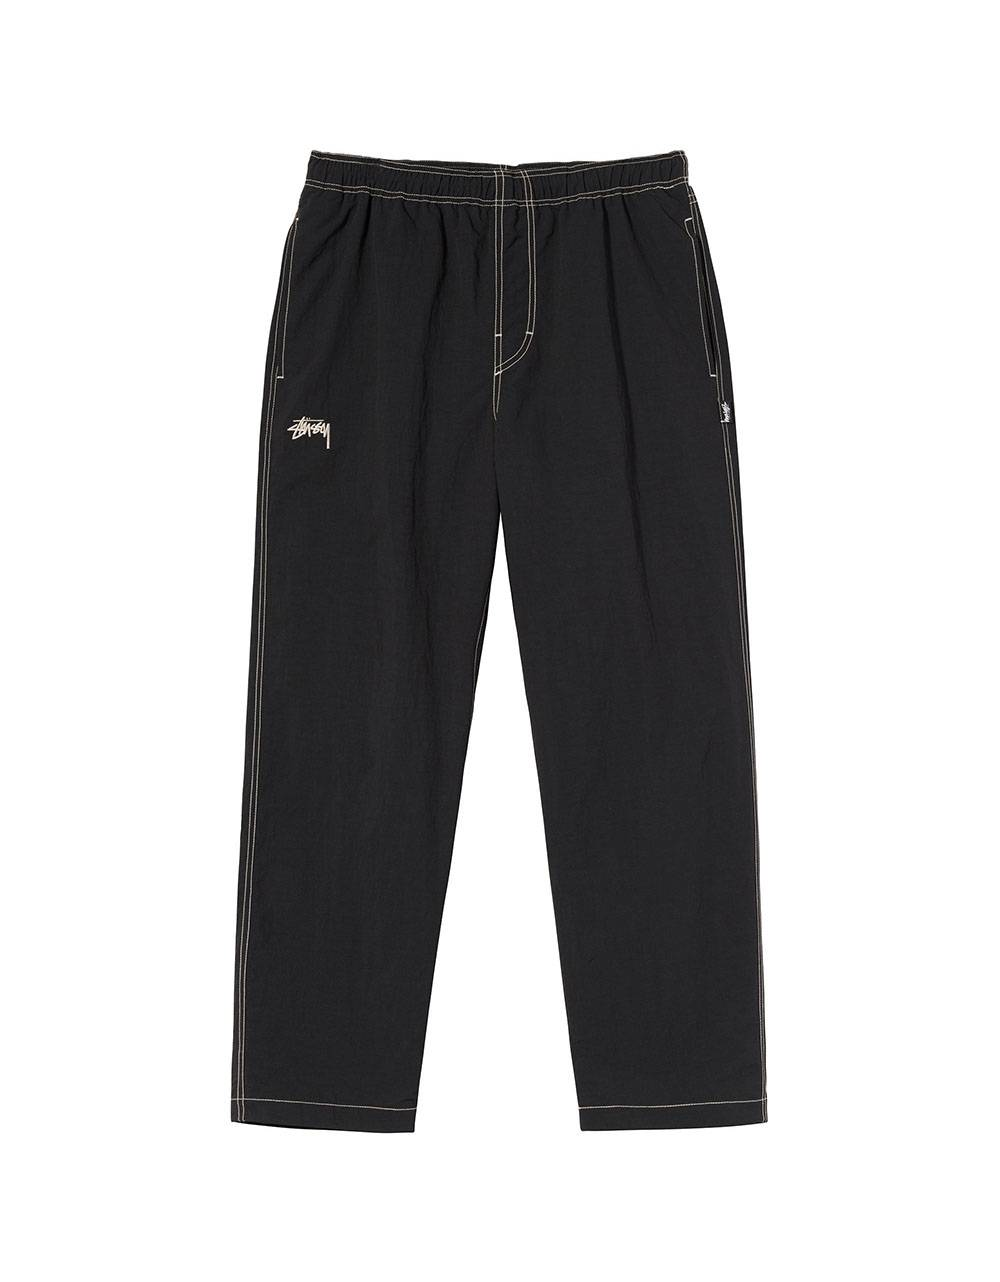 Stussy Folsom beach Pants - black Stussy Pant 135,00€